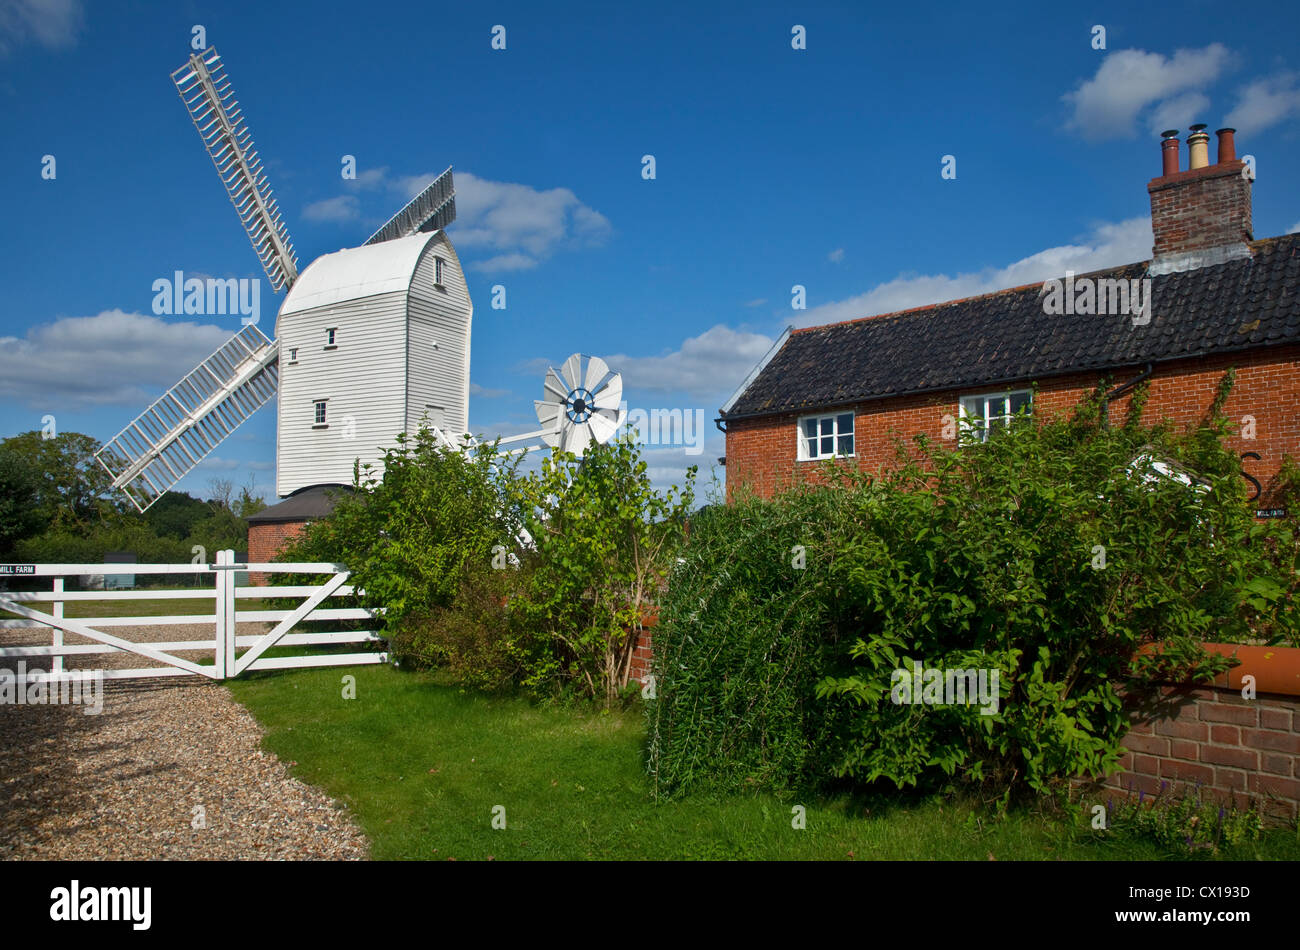 Stanton Bockwindmühle (Windmühle), Stanton, Suffolk, England Stockbild